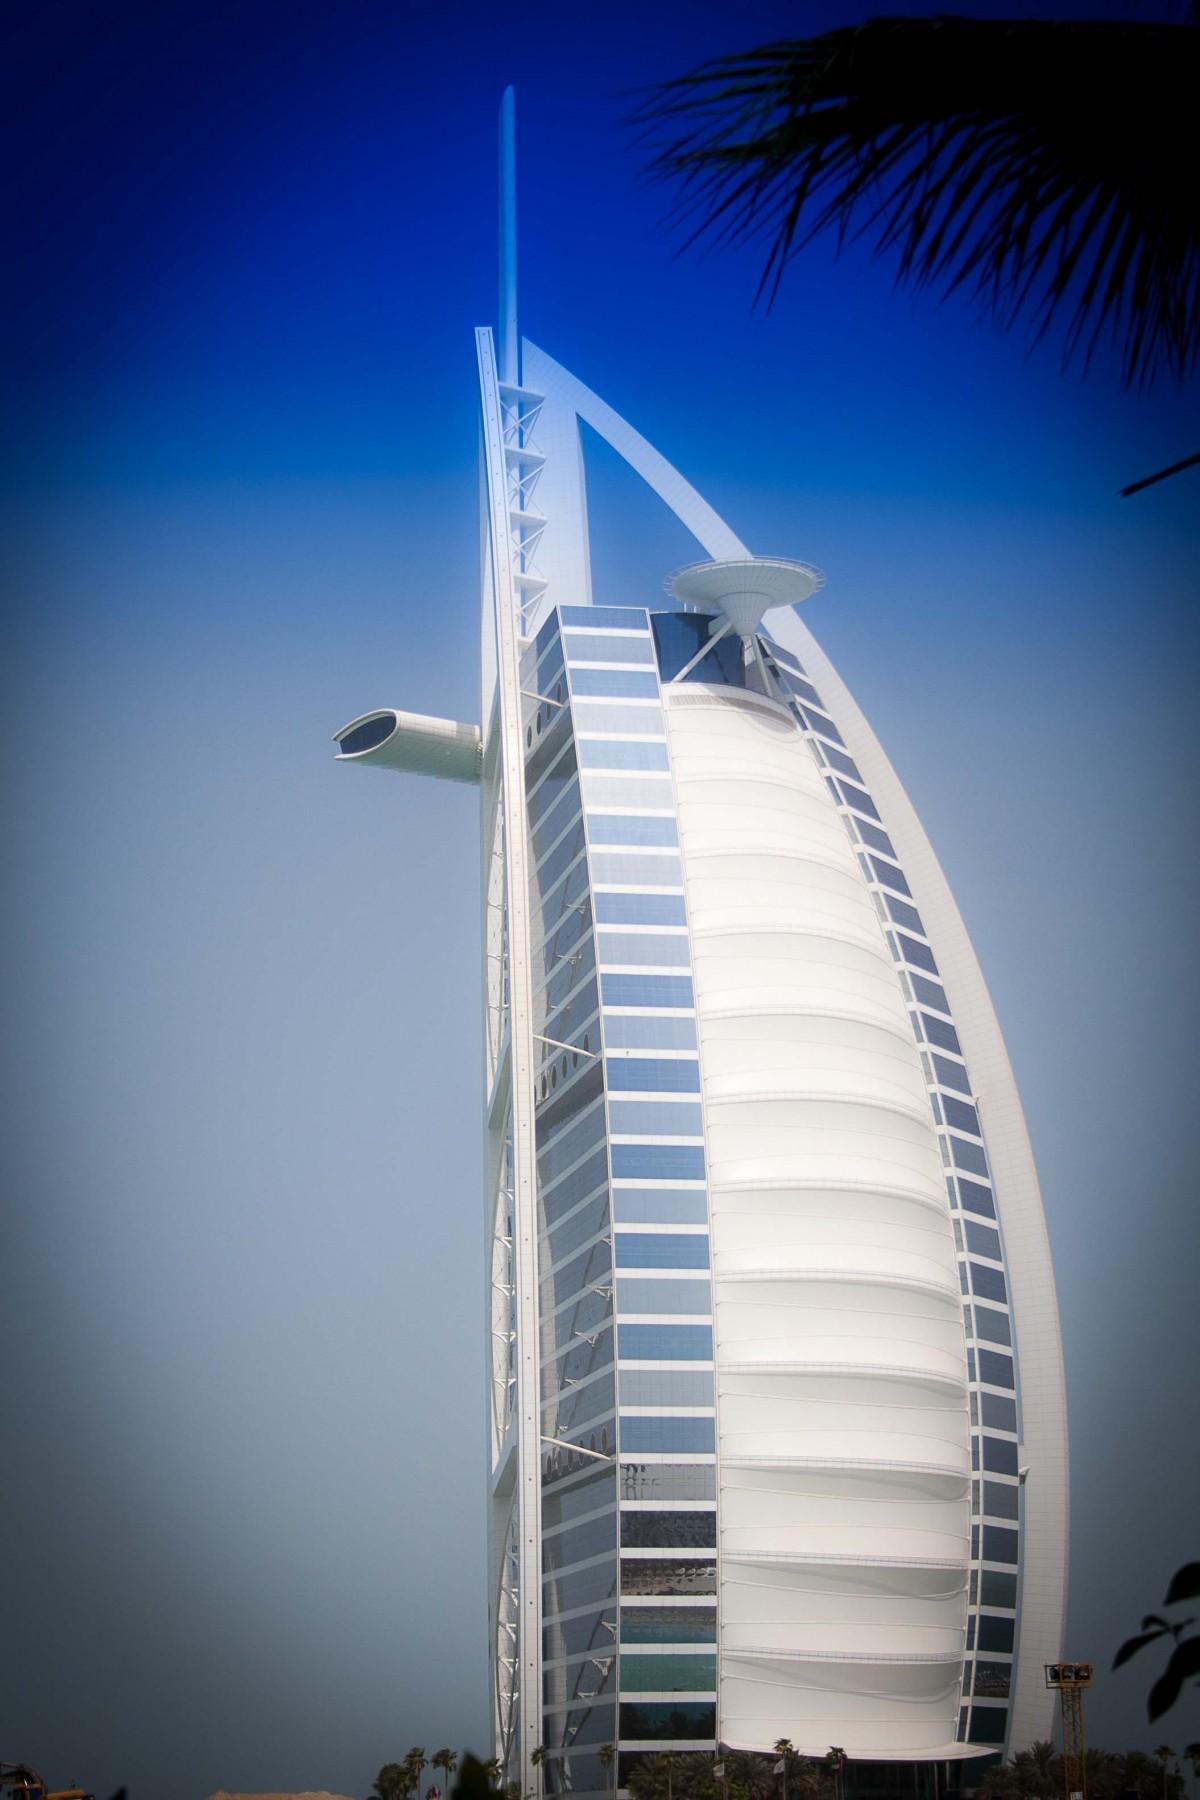 Fotos gratis estructura noche edificio rascacielos for Estructura arquitectura